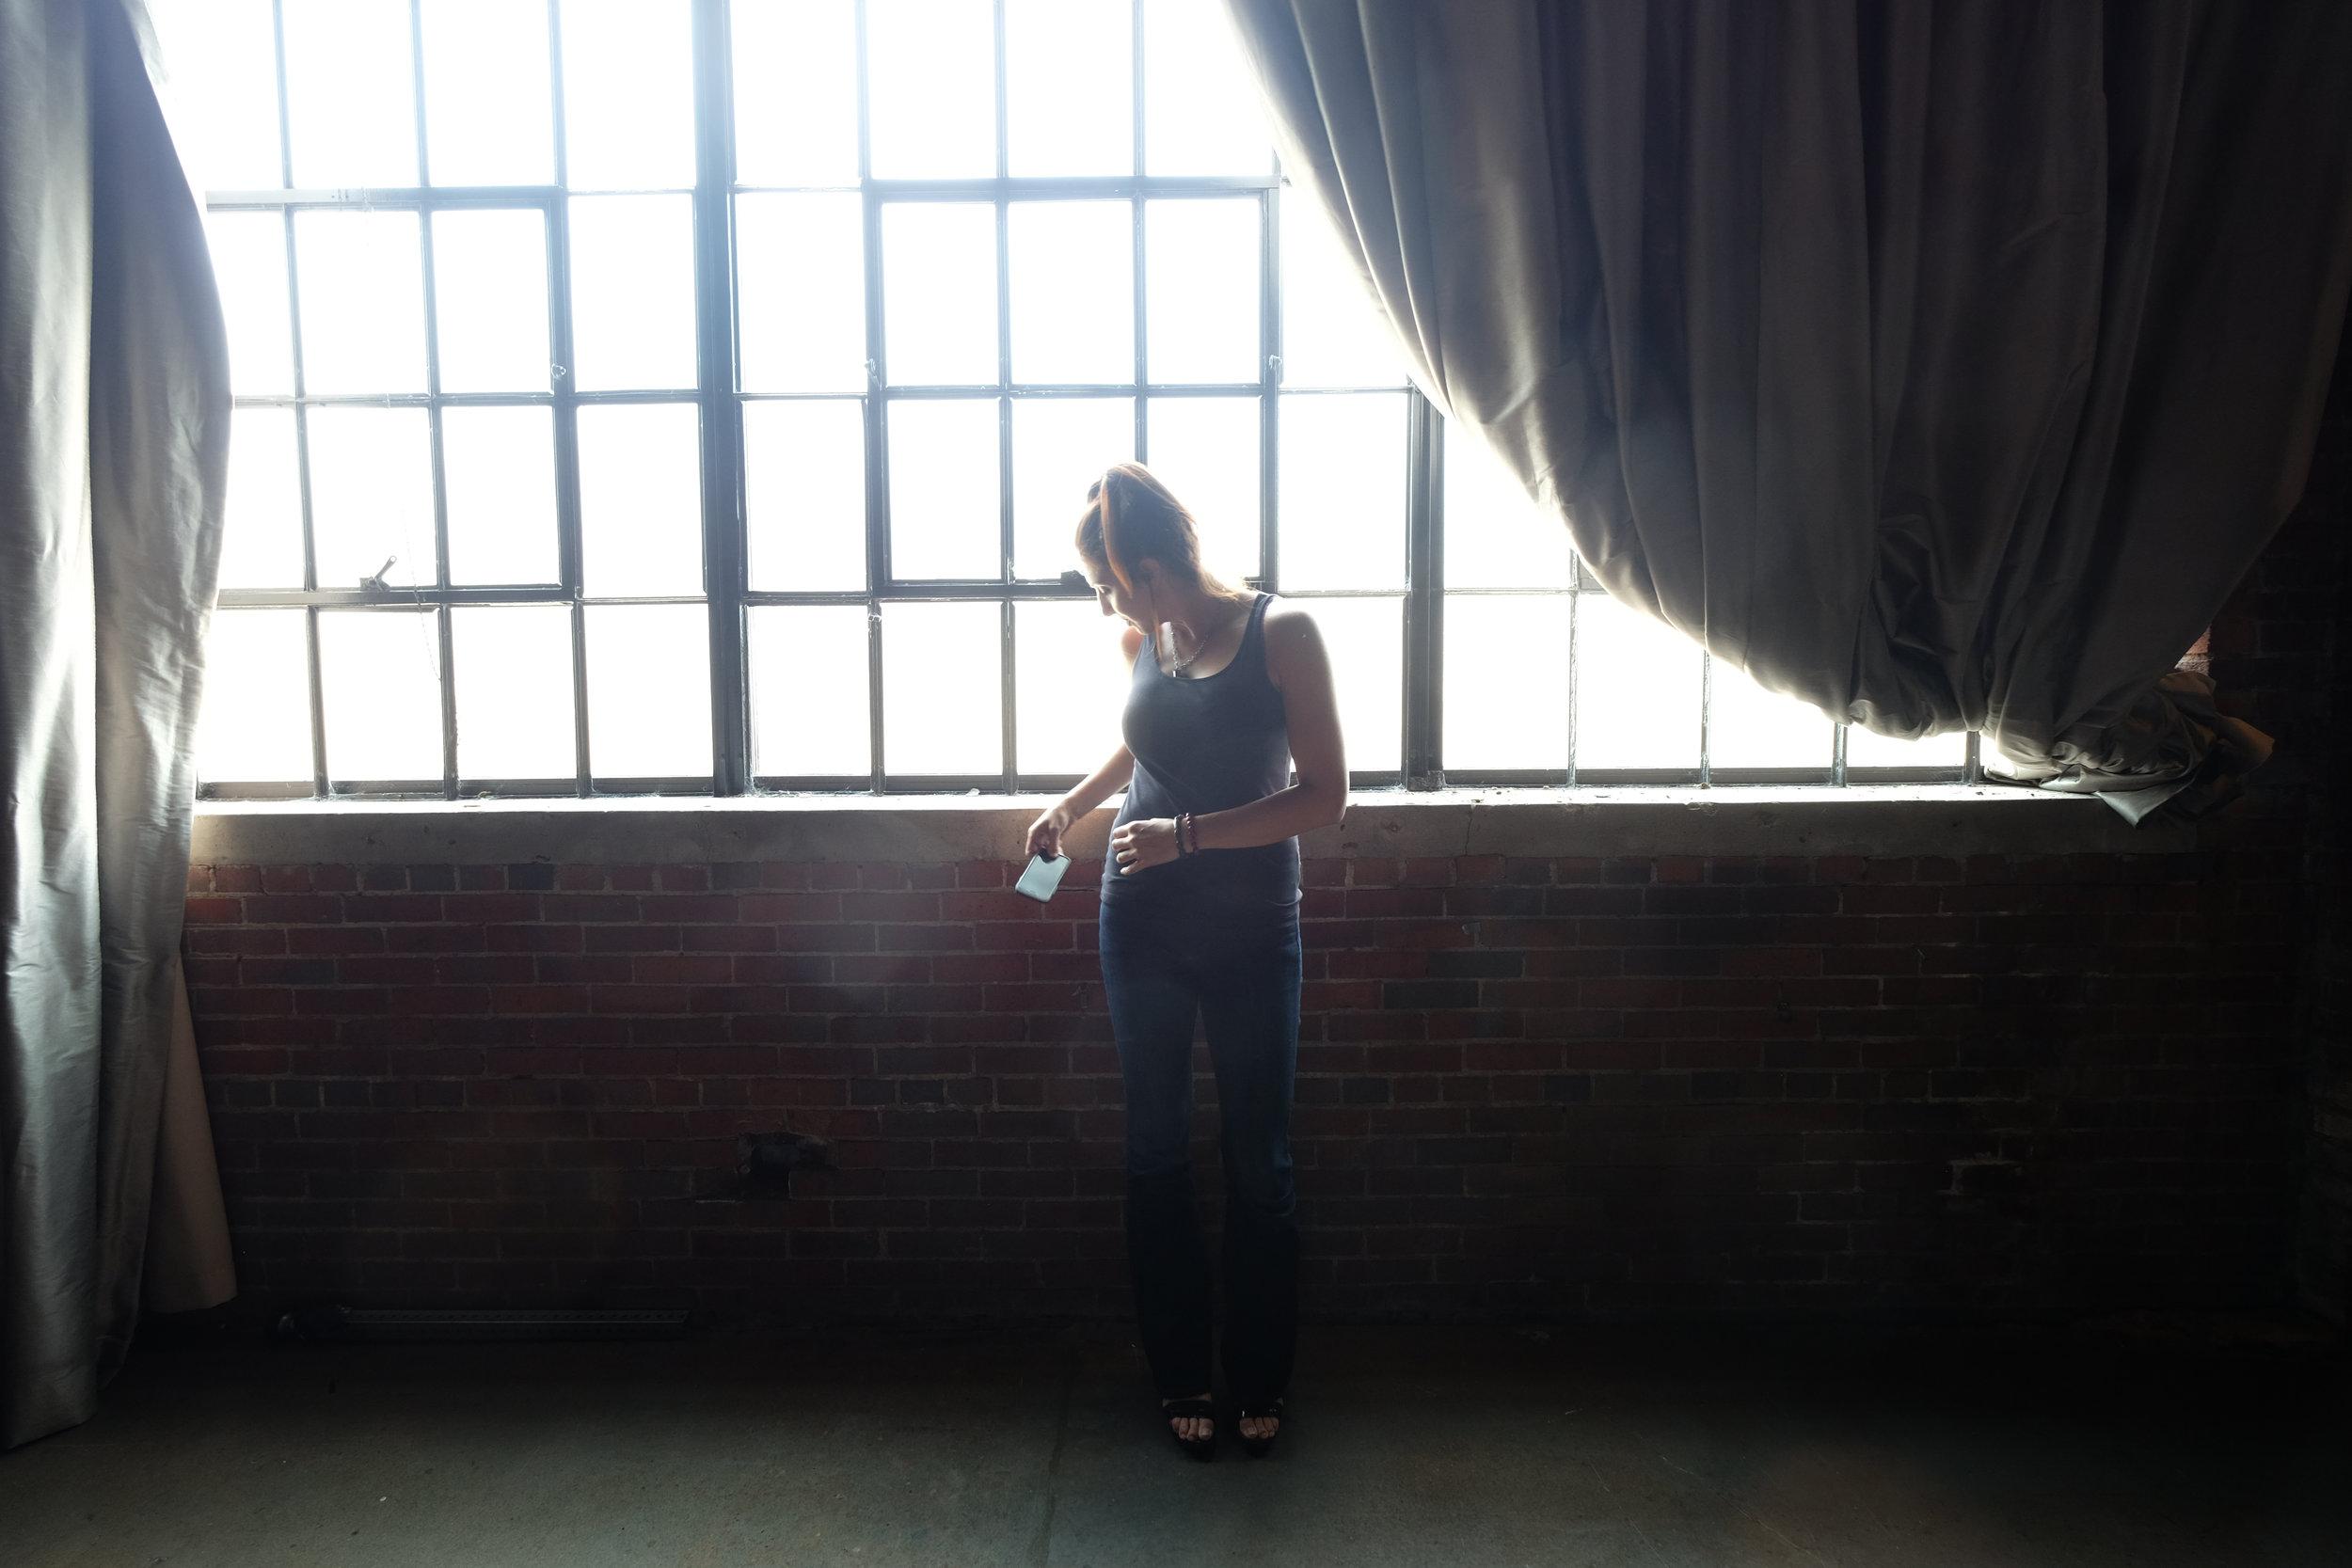 Kim Sawyer, Creative Producer